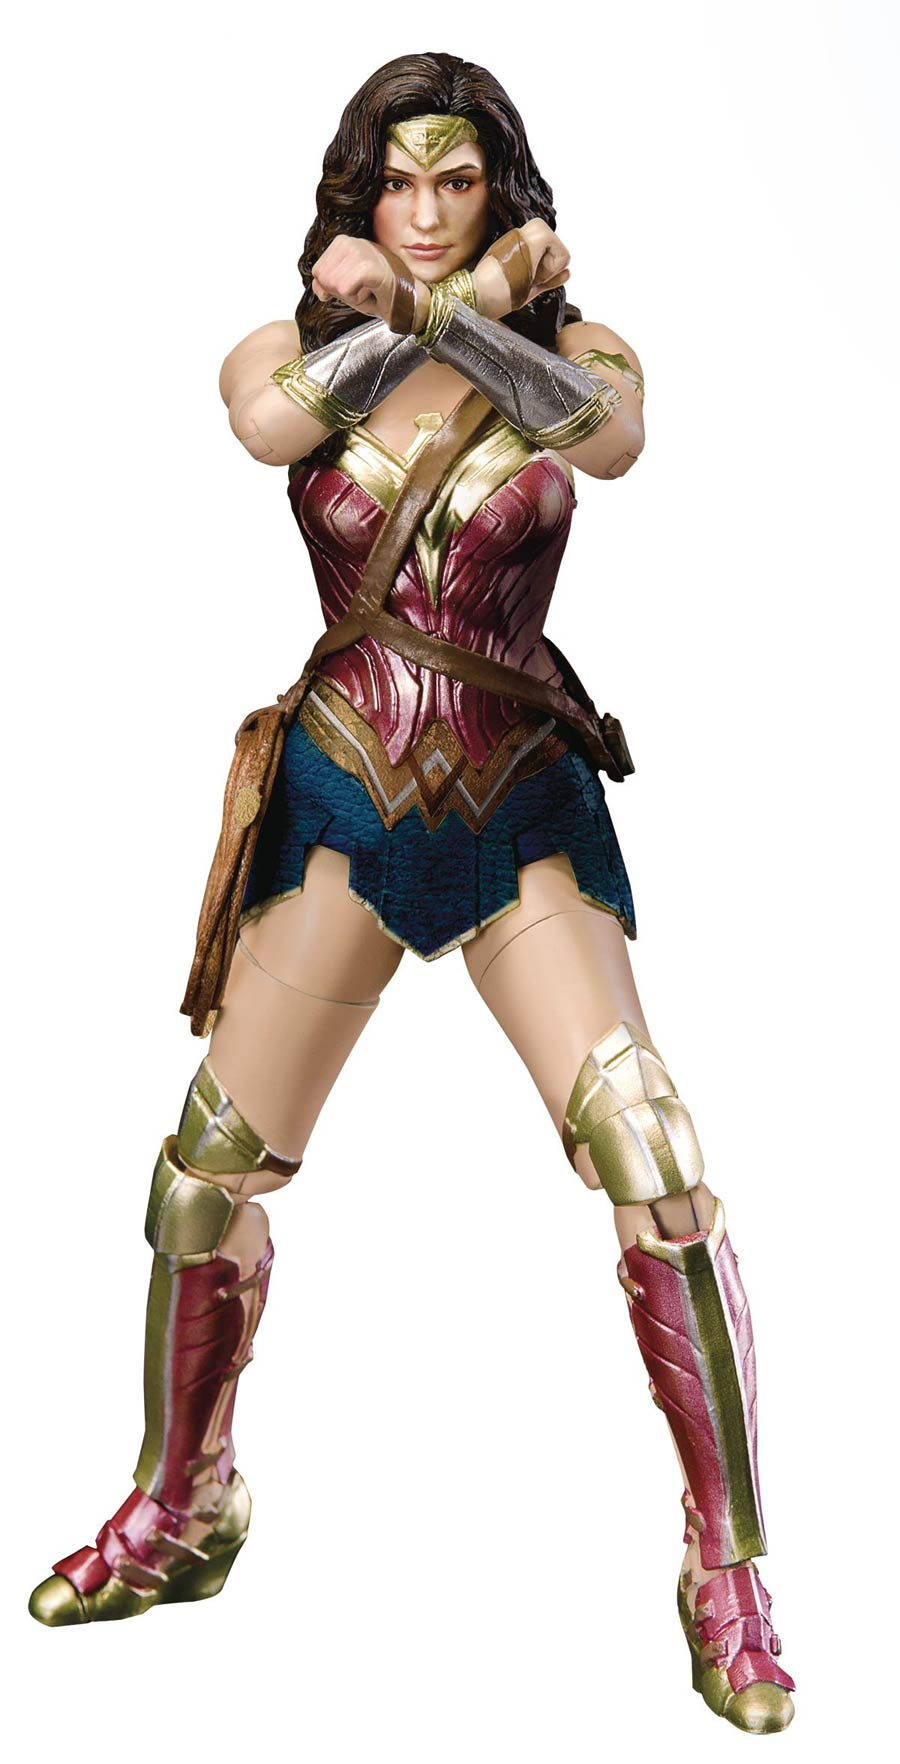 Batman v Superman Dawn Of Justice DAH-002 Dynamic 8-Ction Heroes Wonder Woman Previews Exclusive Action Figure